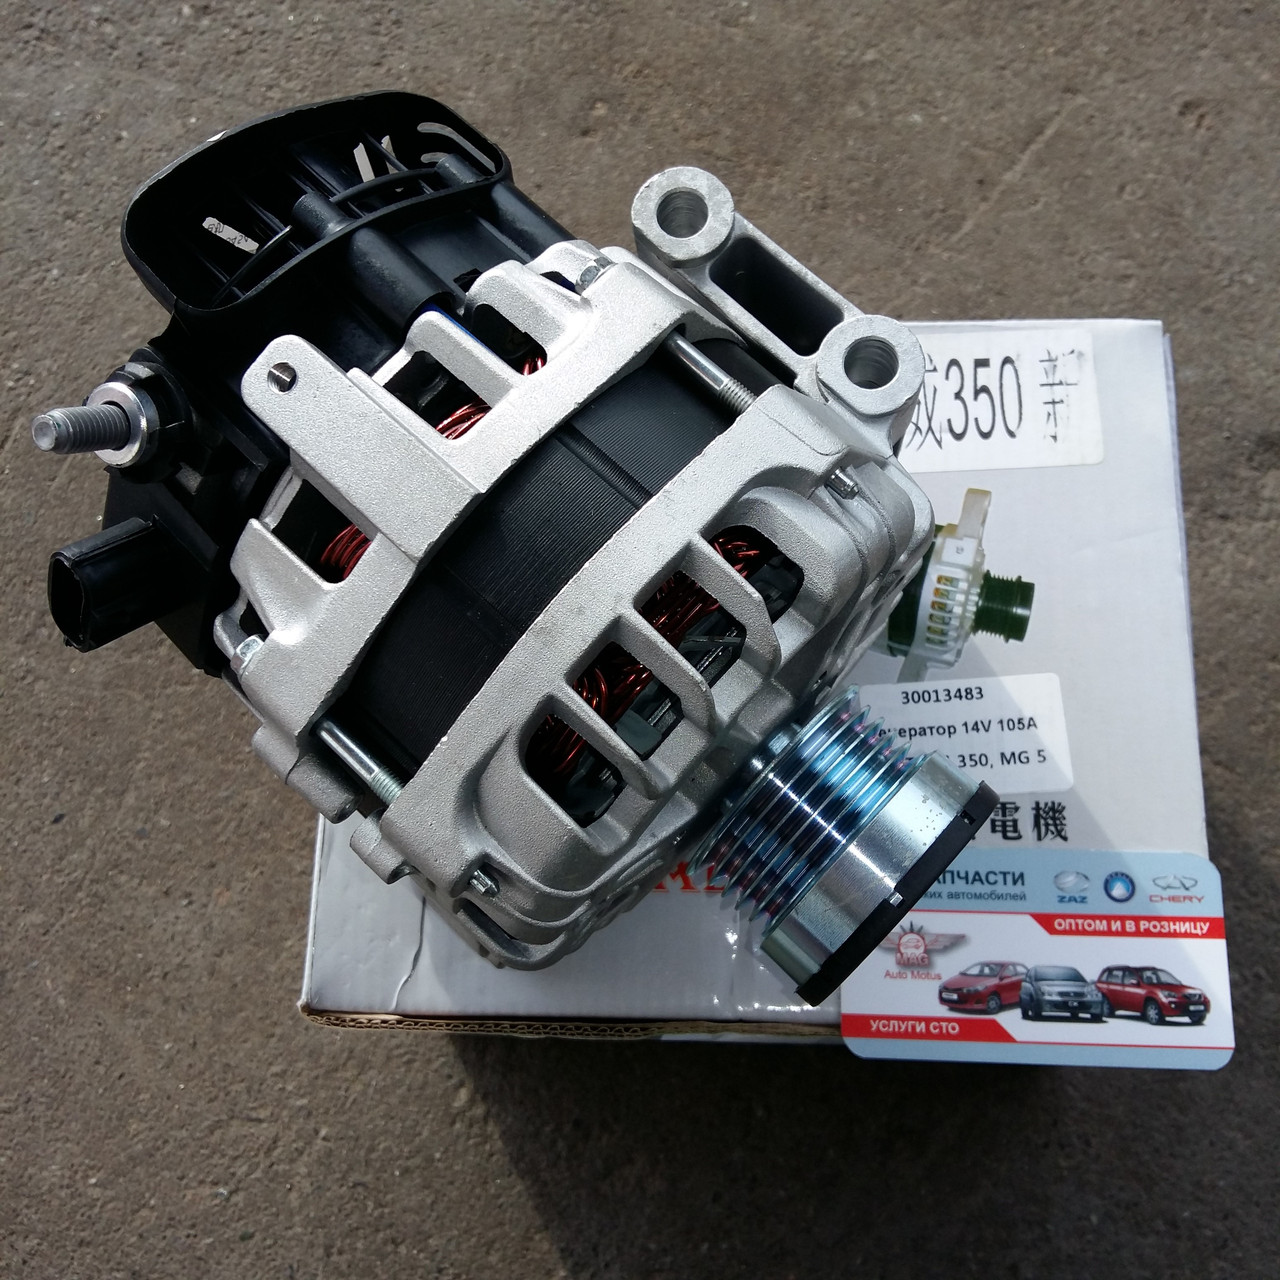 Генератор 14V 105A  30013483  5 MT MG 350, MG 5